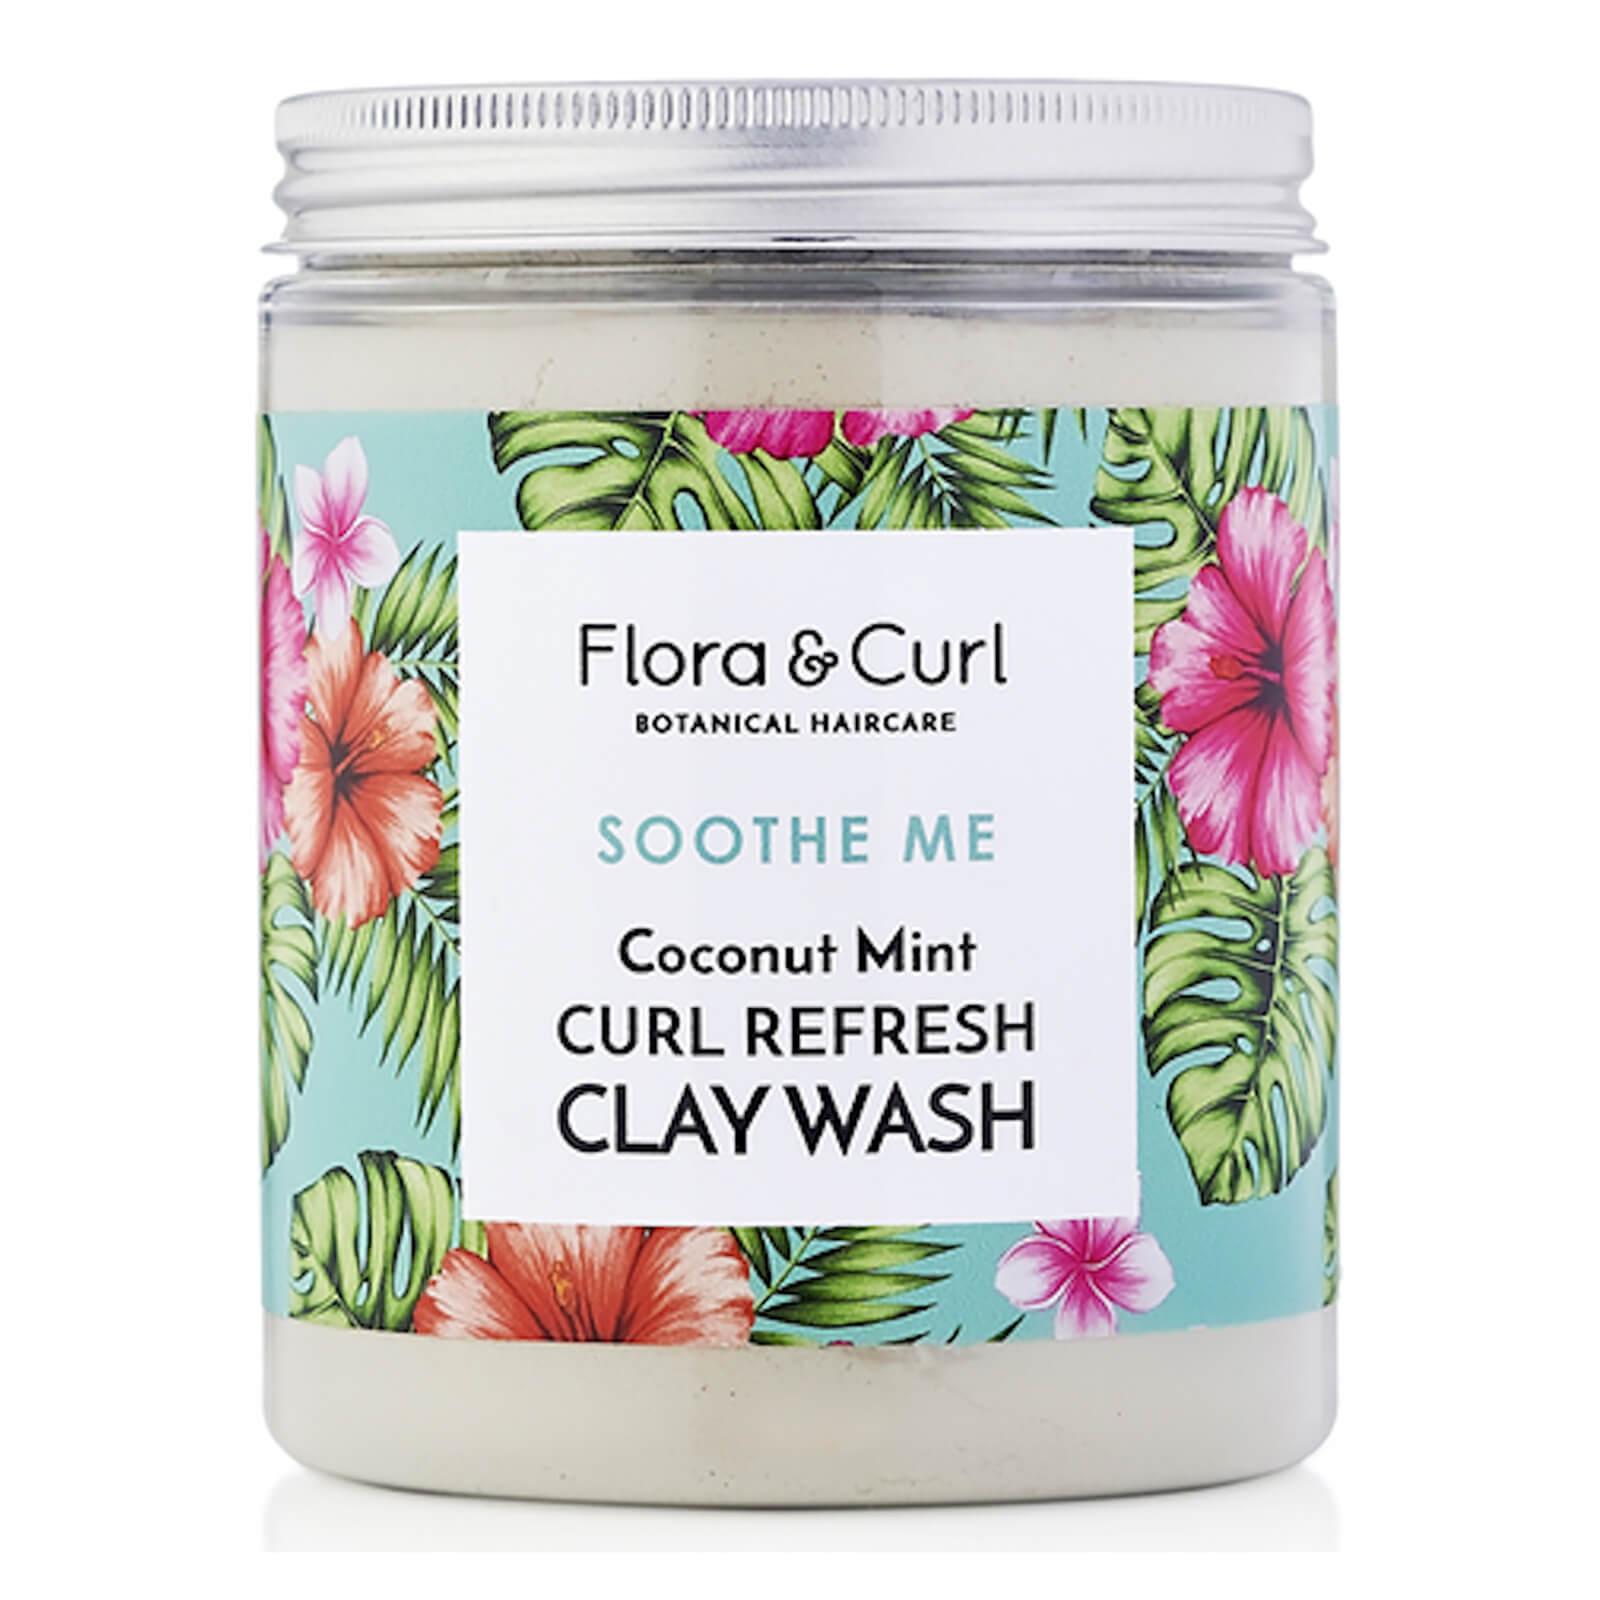 Купить Flora & Curl Coconut Mint Curl Refresh Clay Wash 260g